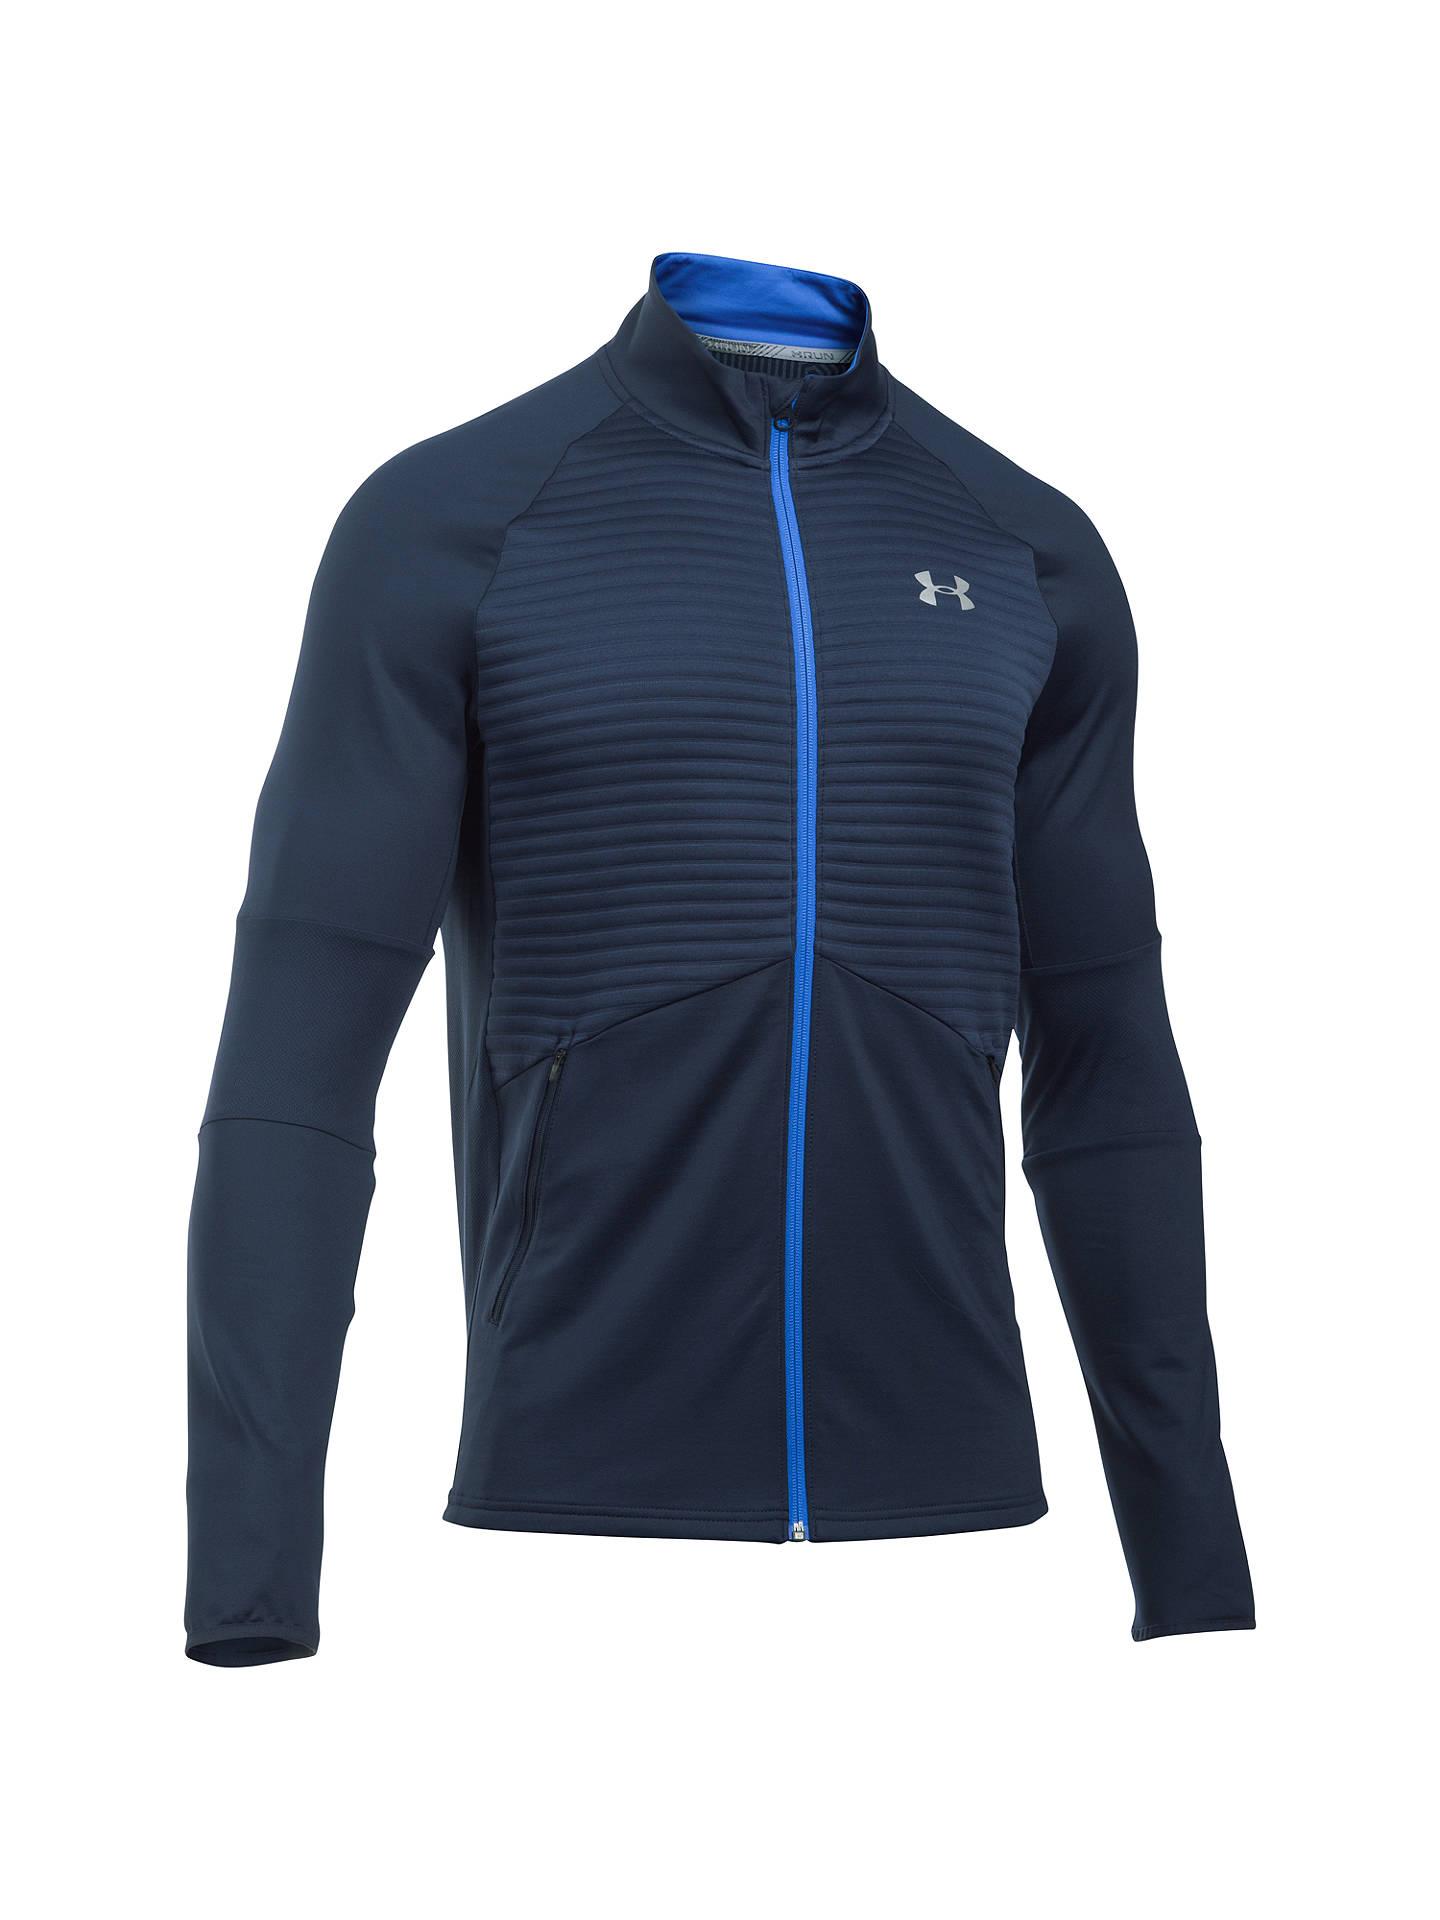 9ae50d3081 Buy Under Armour NoBreaks ColdGear Infrared Men's Running Jacket, Blue, S  Online at johnlewis ...